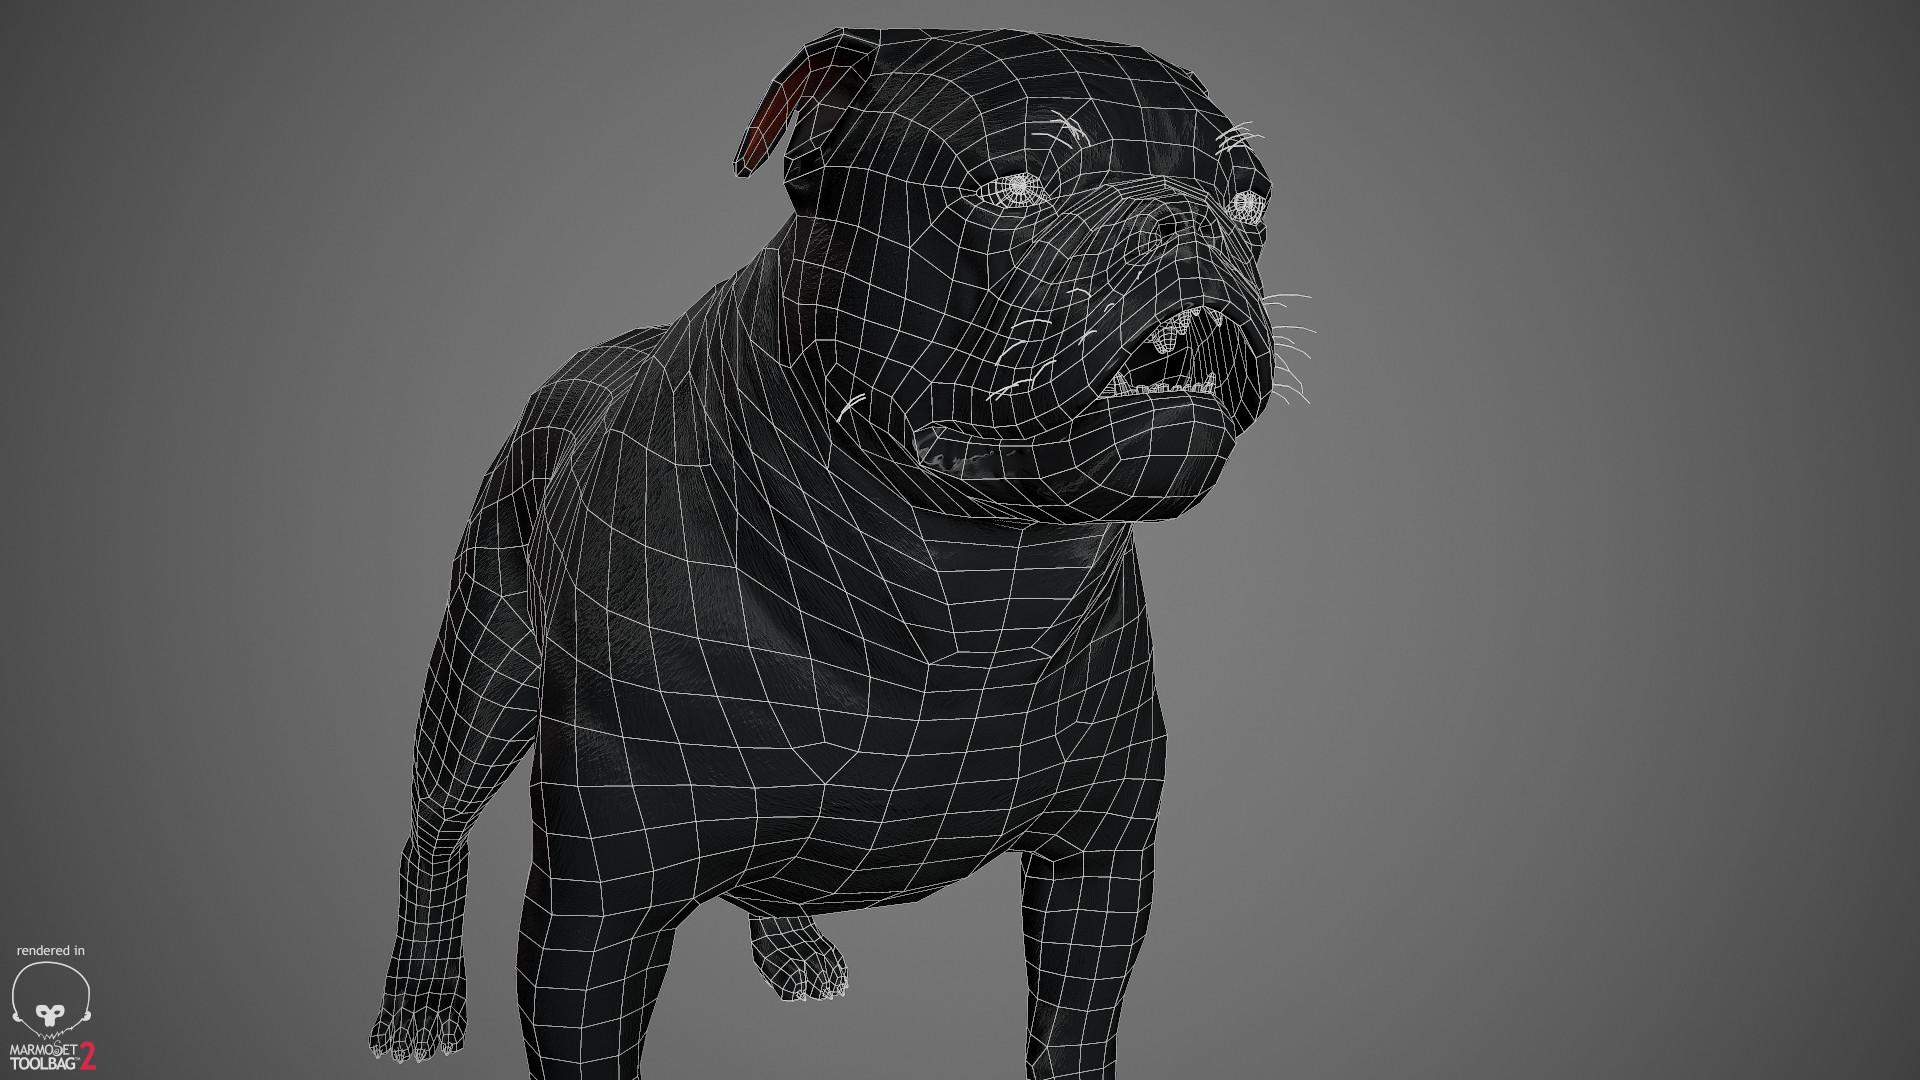 Alex lashko englishbulldog by alexlashko wireframe 05